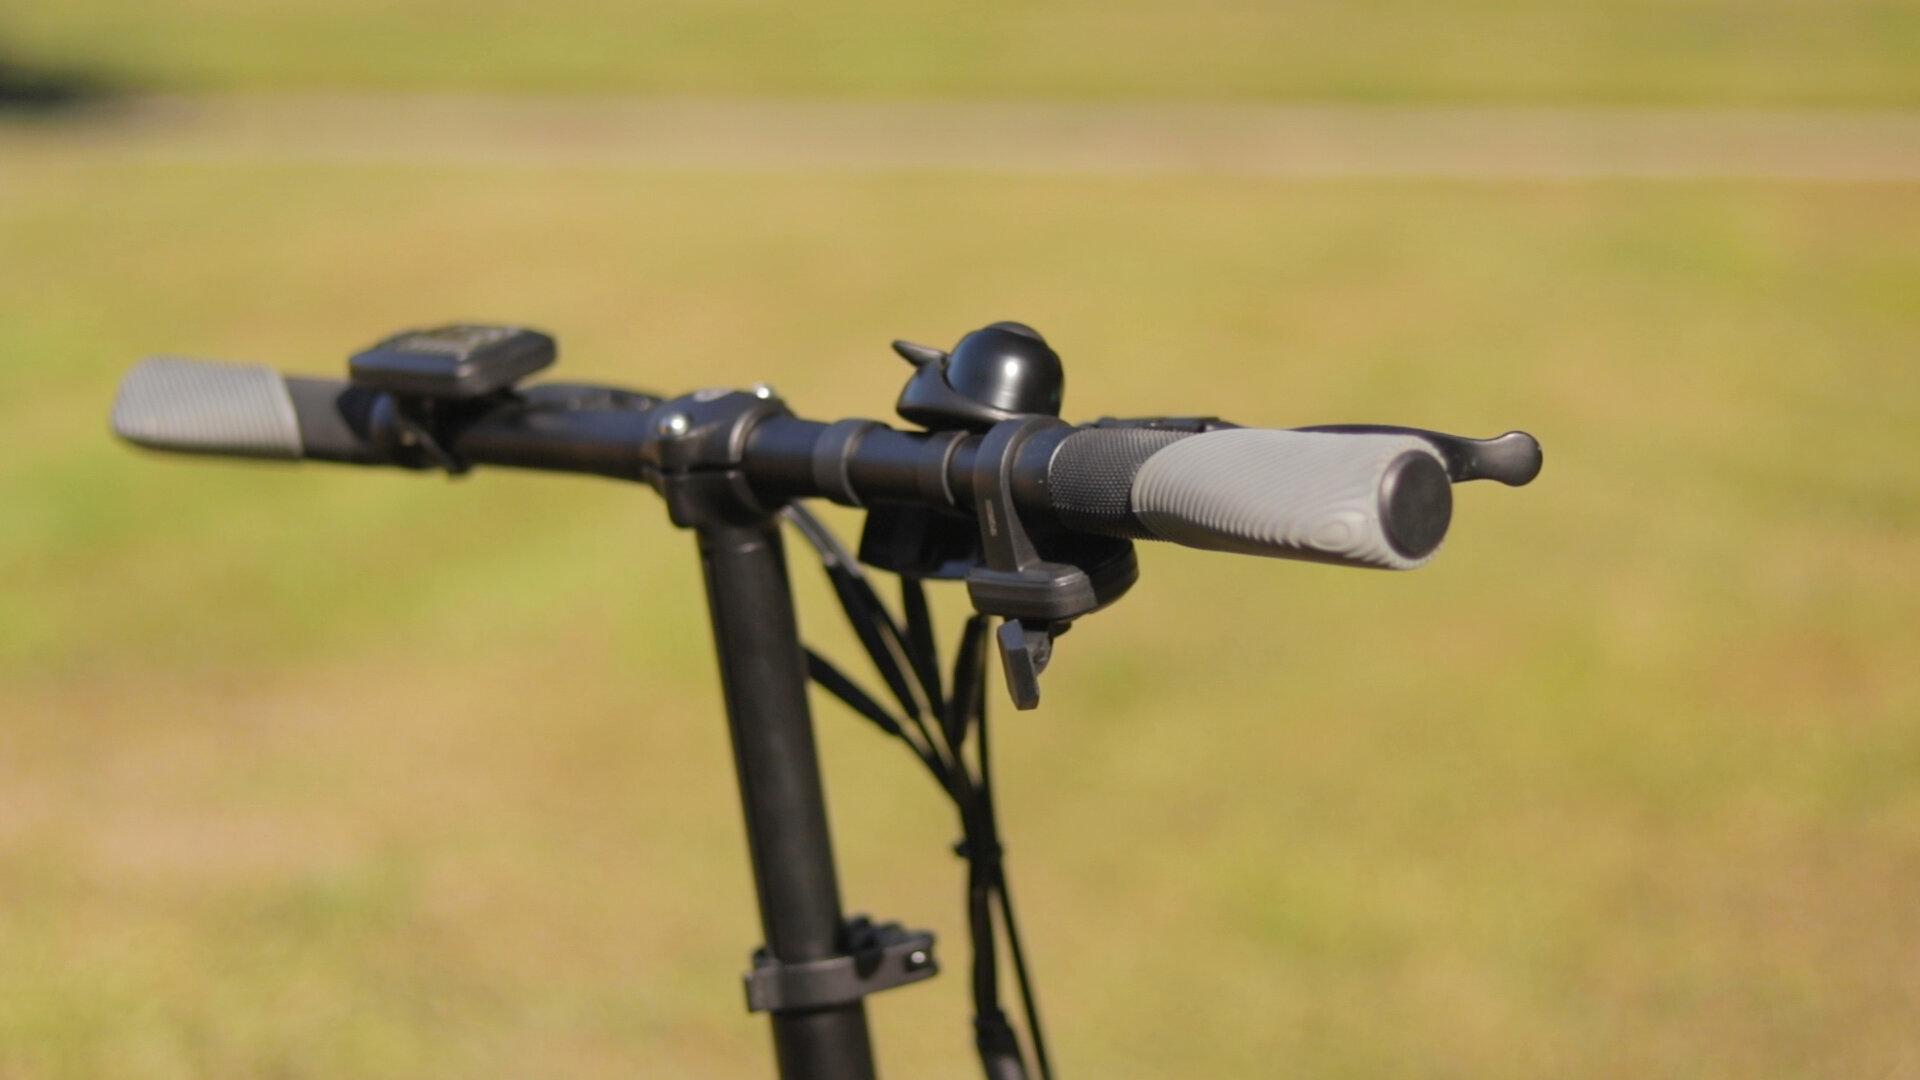 gotrax-shift-s1-electric-bike-review-2019-handelbars.jpg